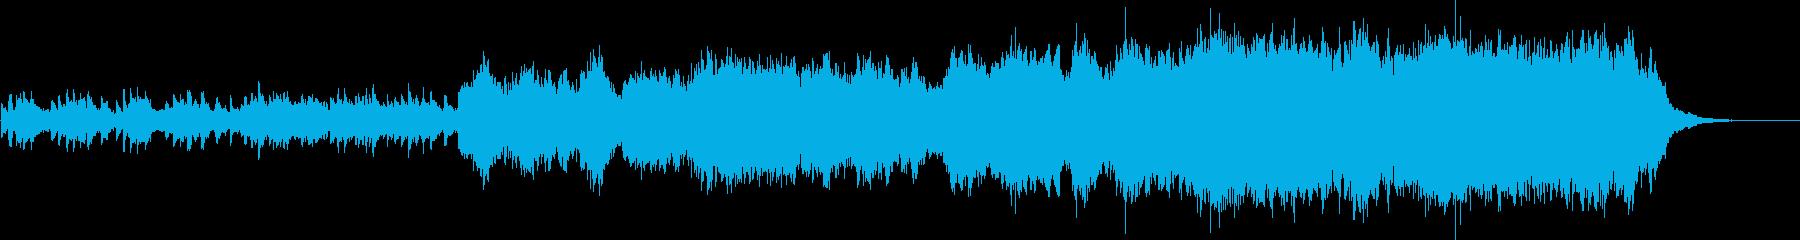 Christmas: Traditional Christmas Music's reproduced waveform